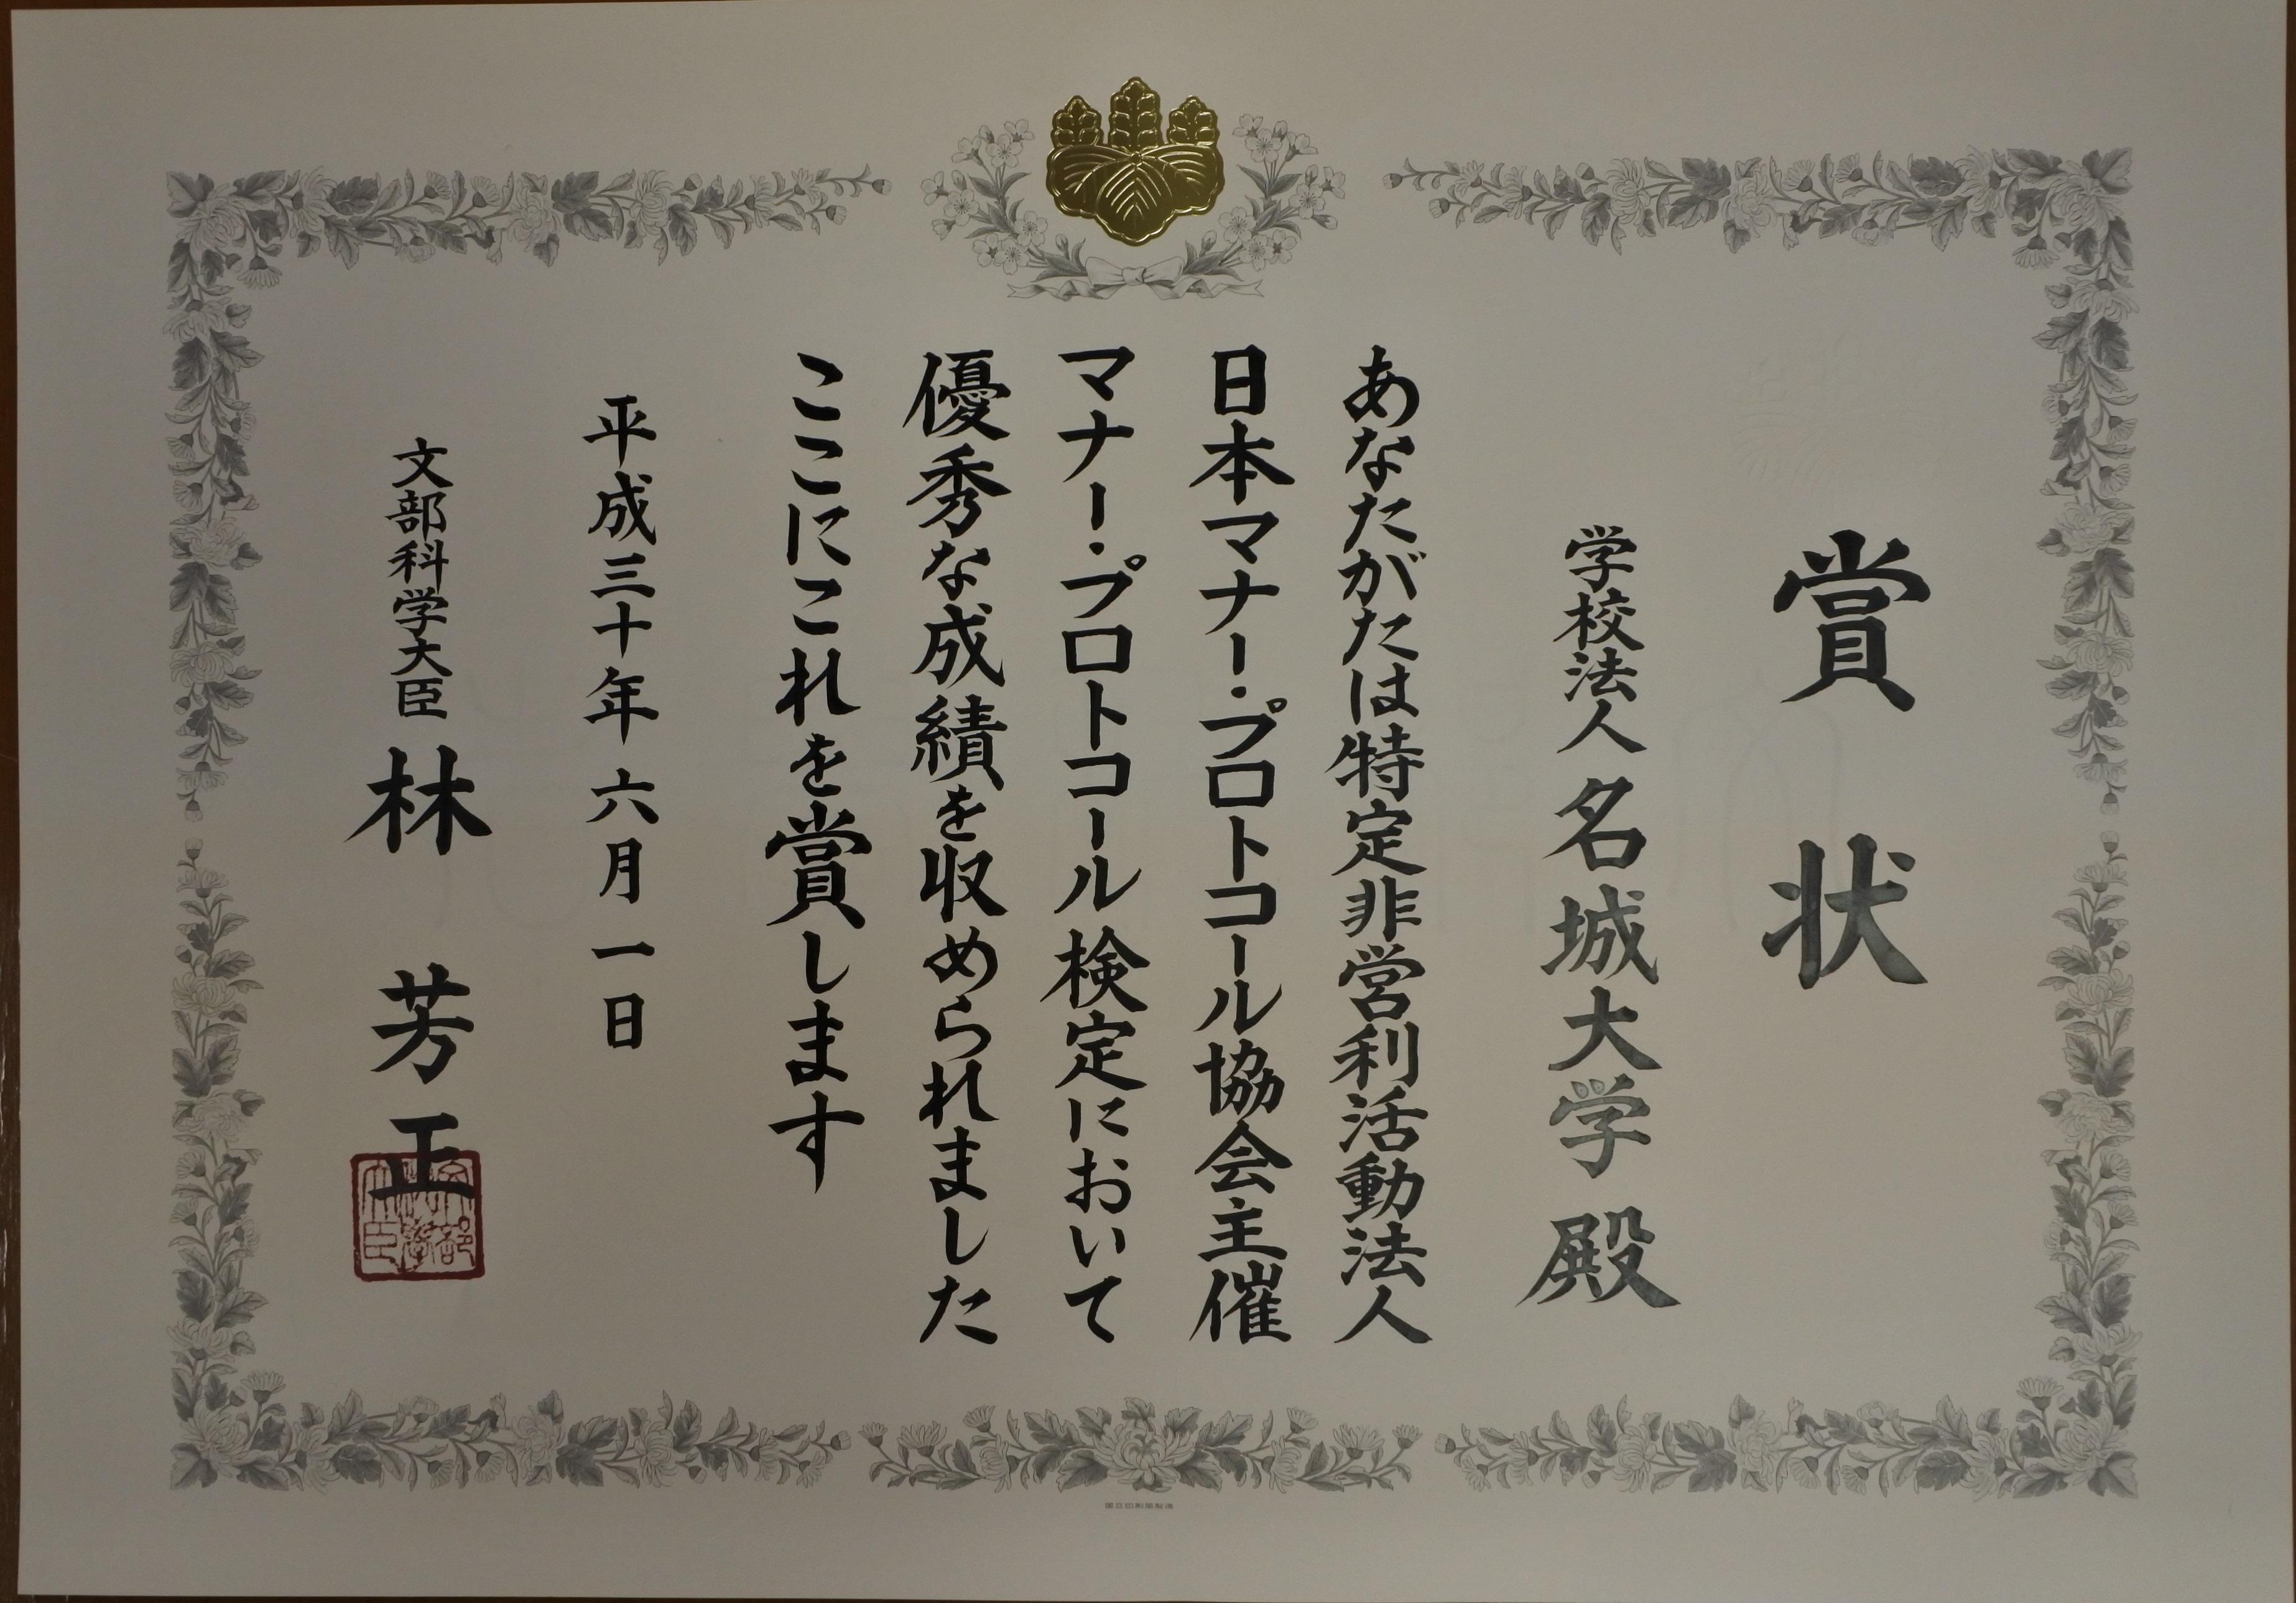 文部科学大臣賞の賞状